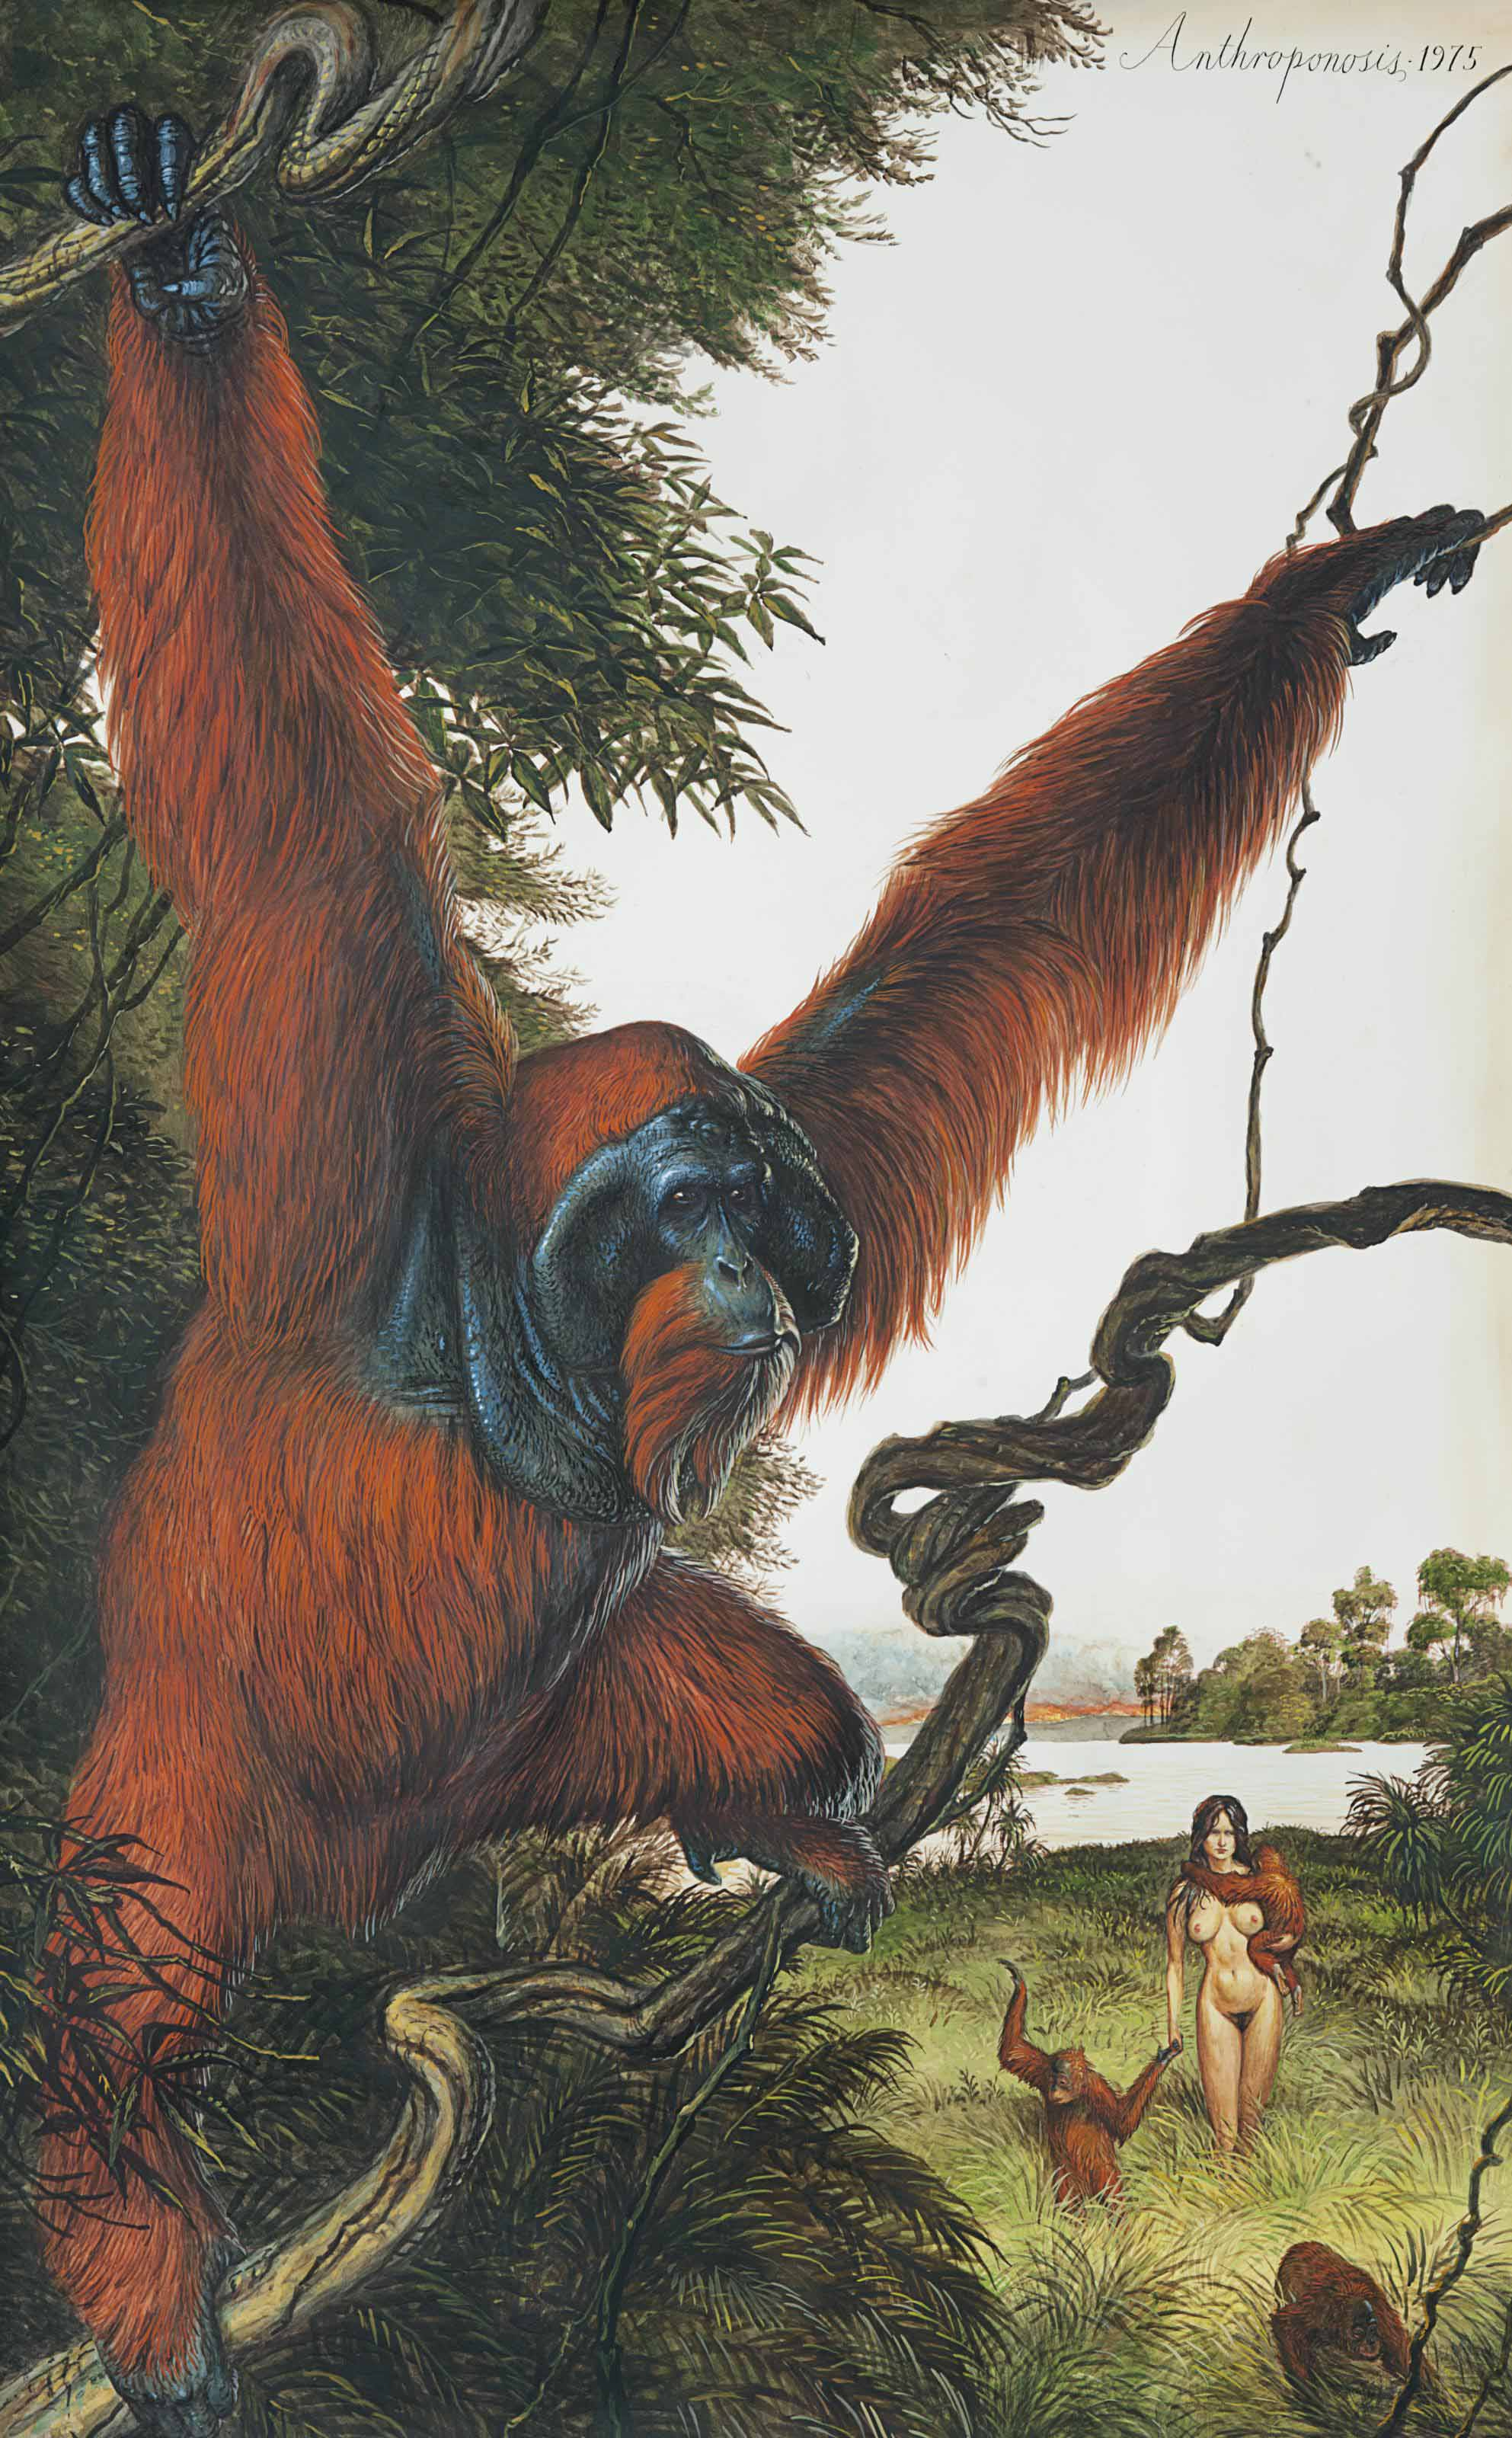 Anthroponosis - 1975